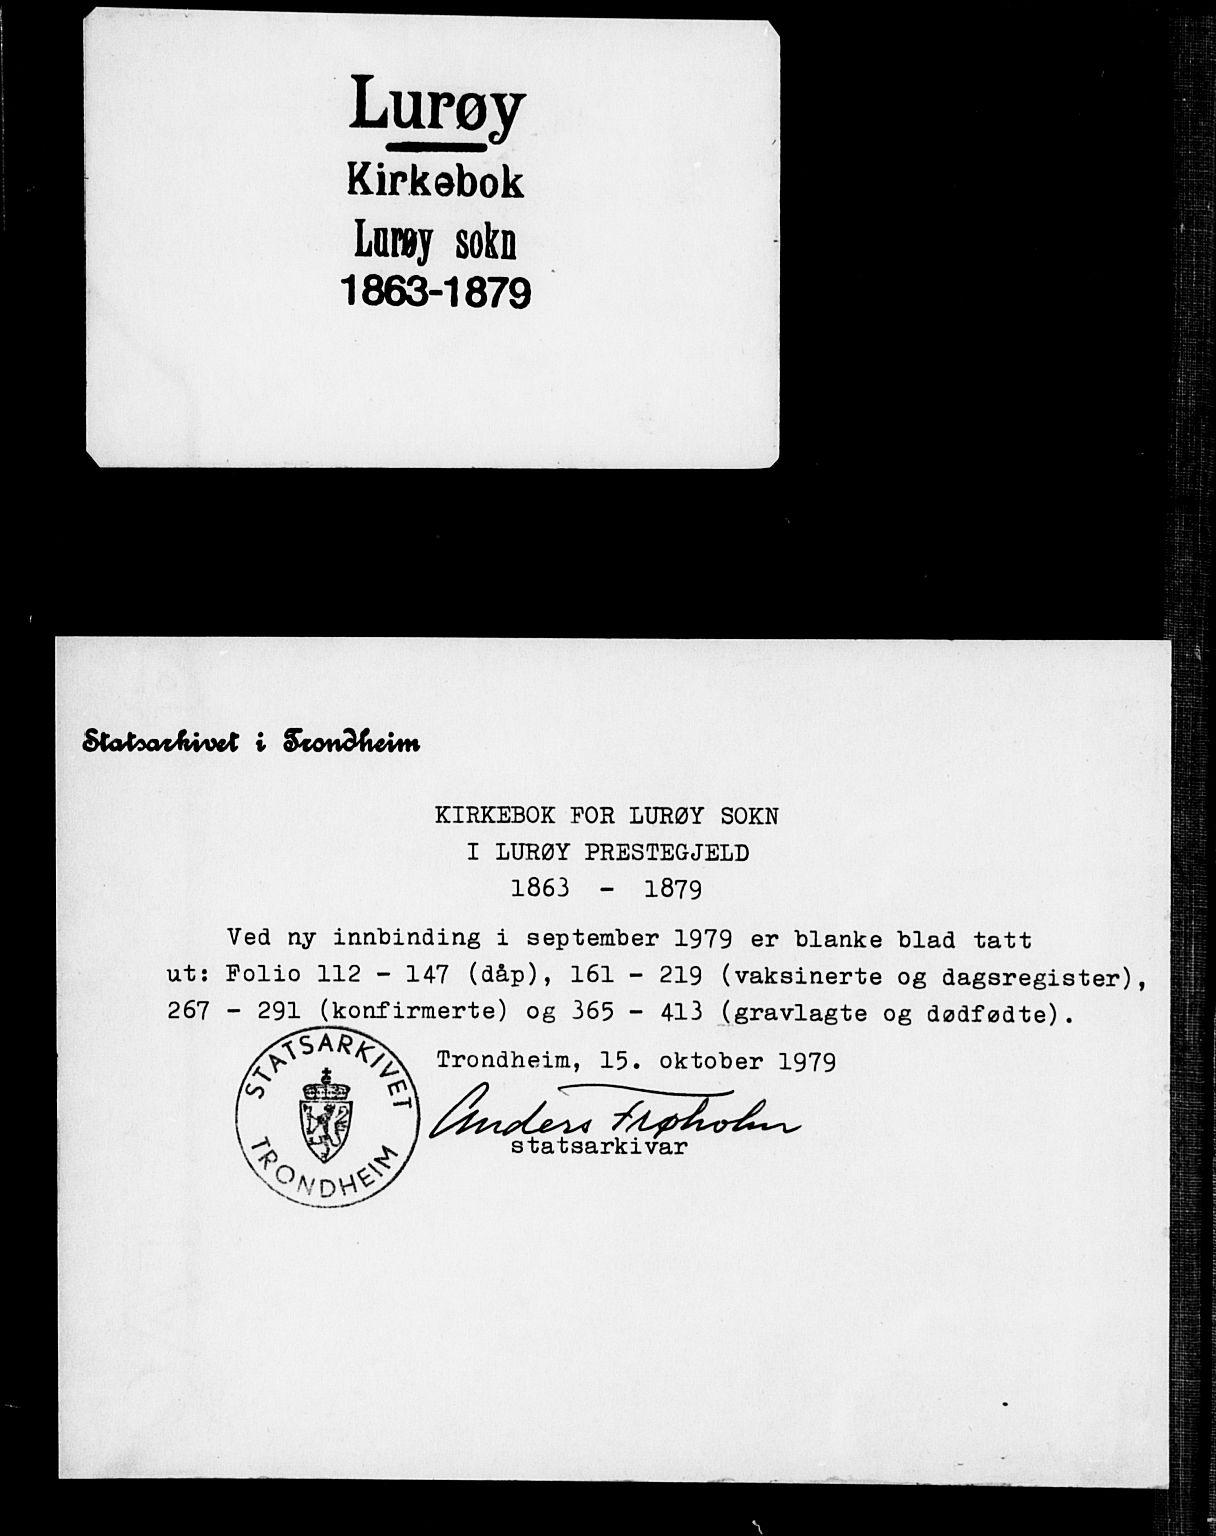 SAT, Ministerialprotokoller, klokkerbøker og fødselsregistre - Nordland, 839/L0567: Ministerialbok nr. 839A04, 1863-1879